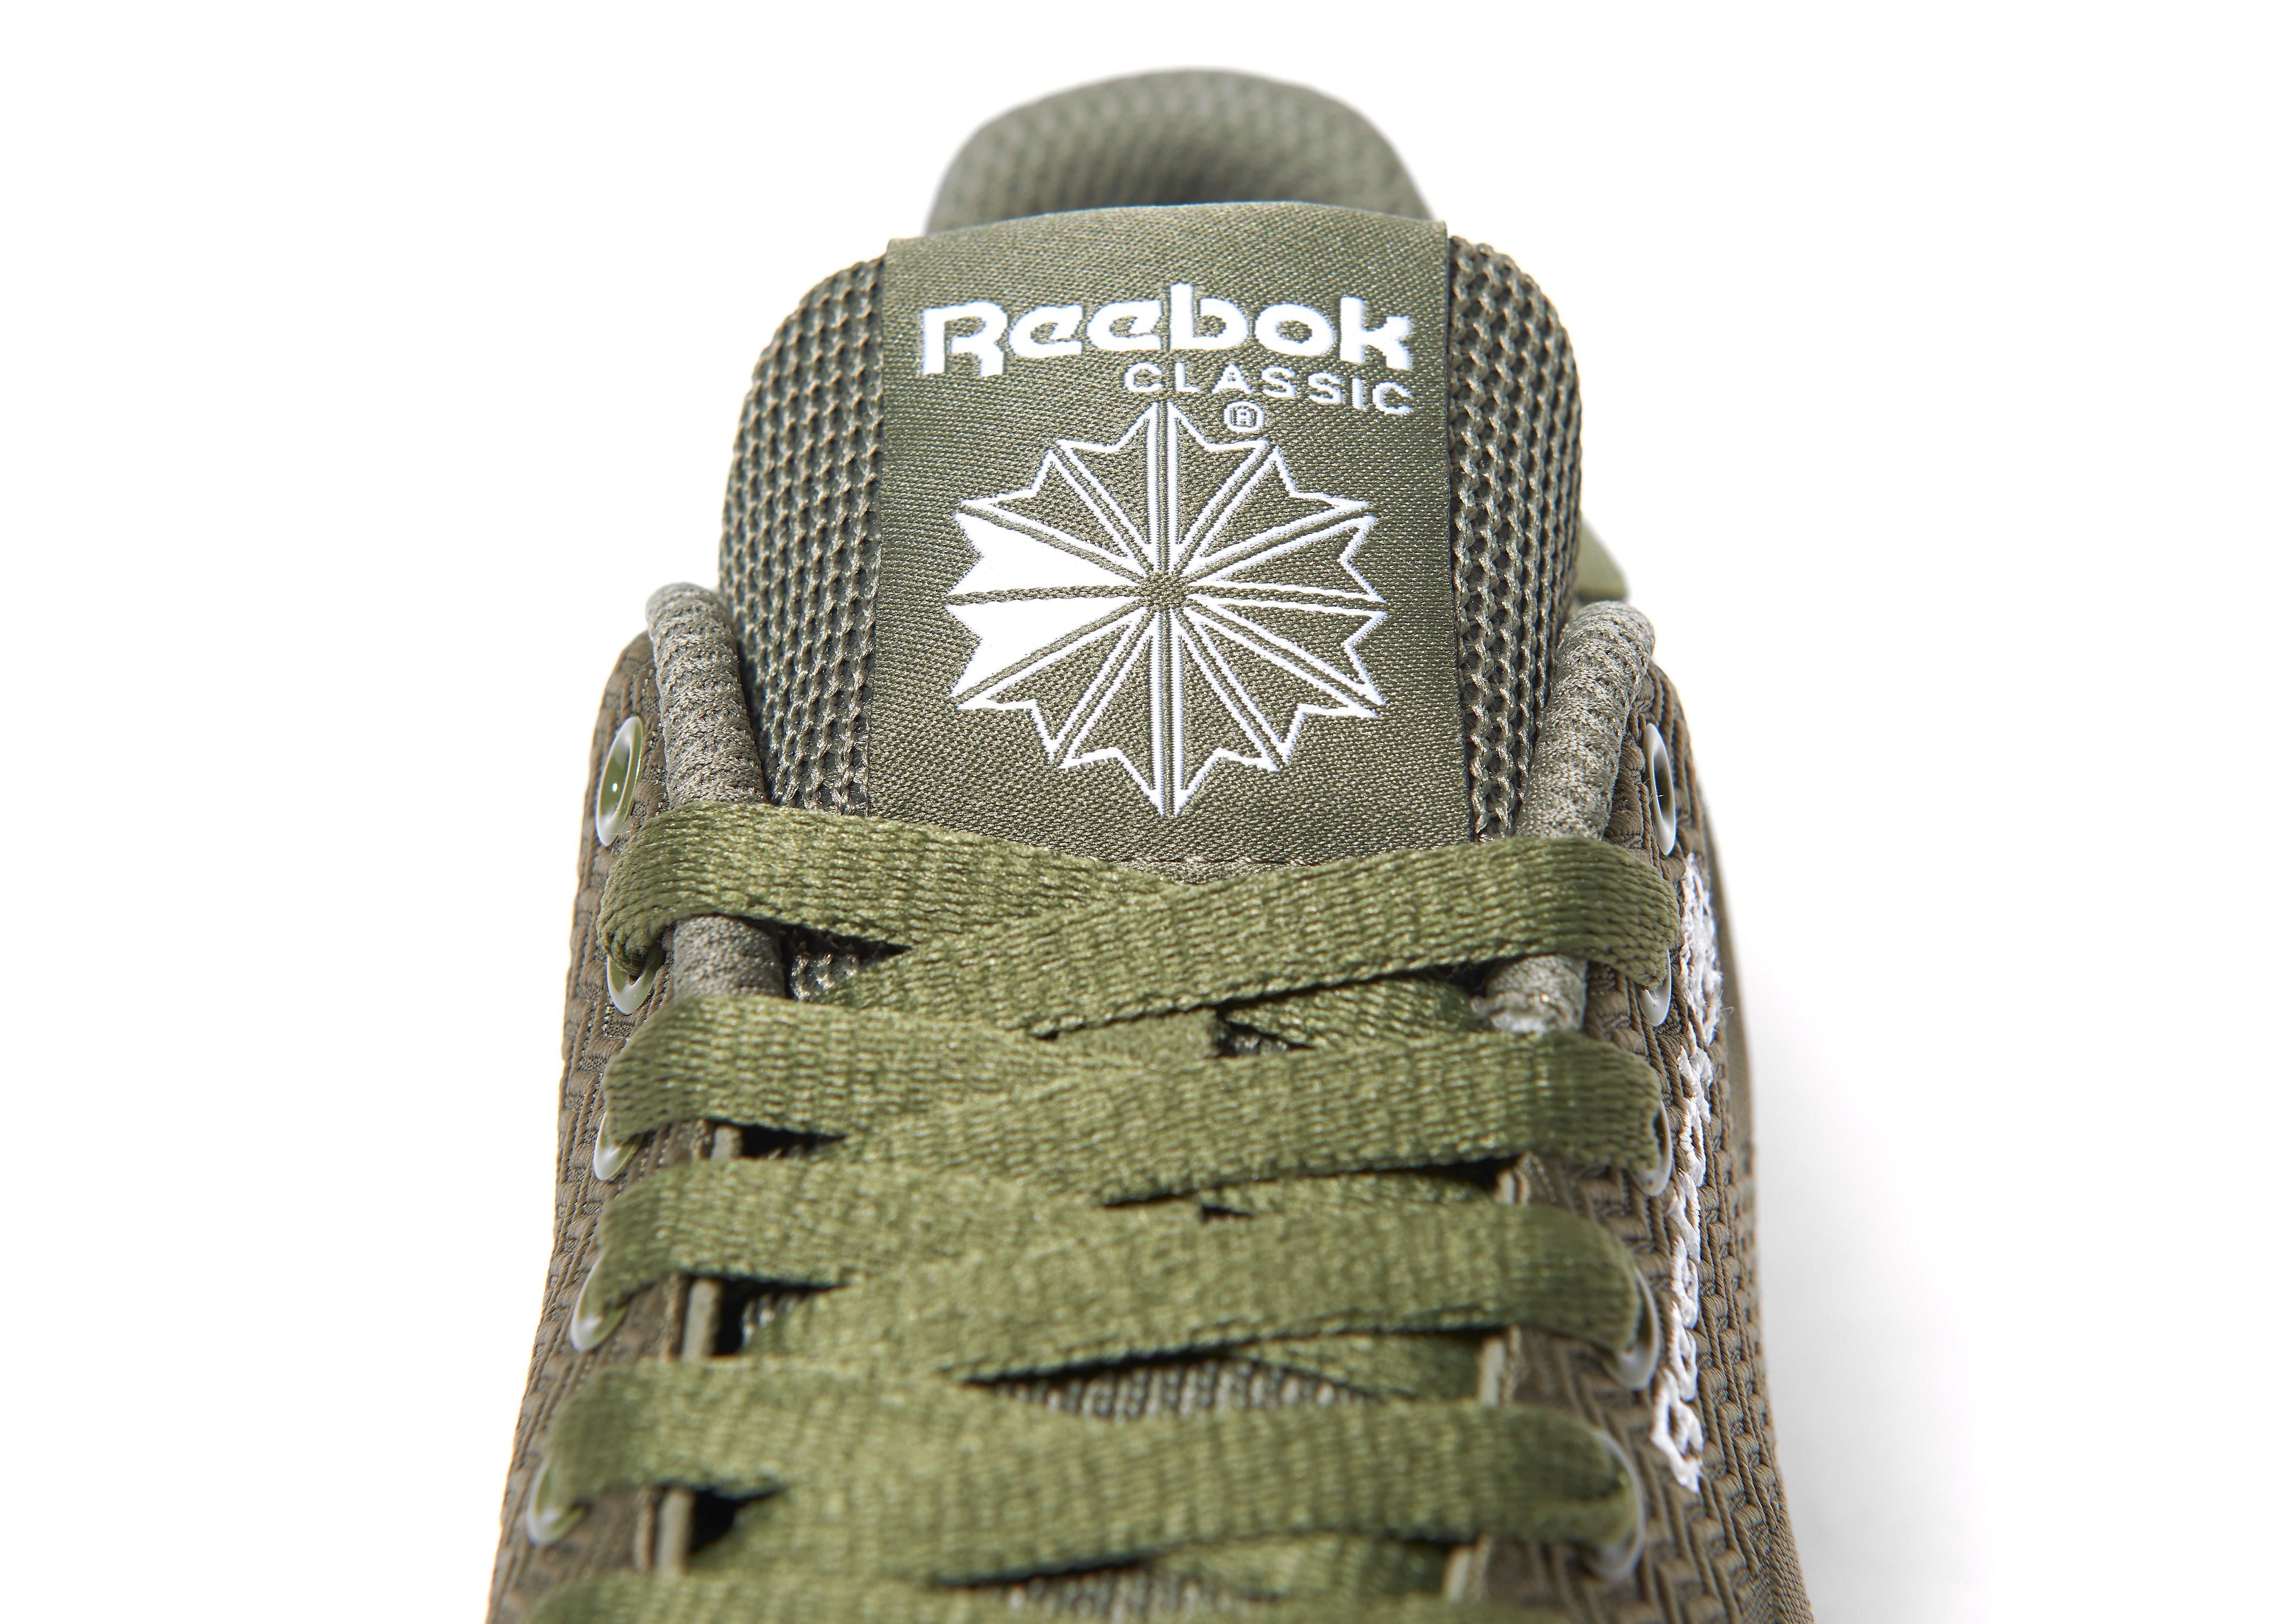 Reebok Classic Jacquard